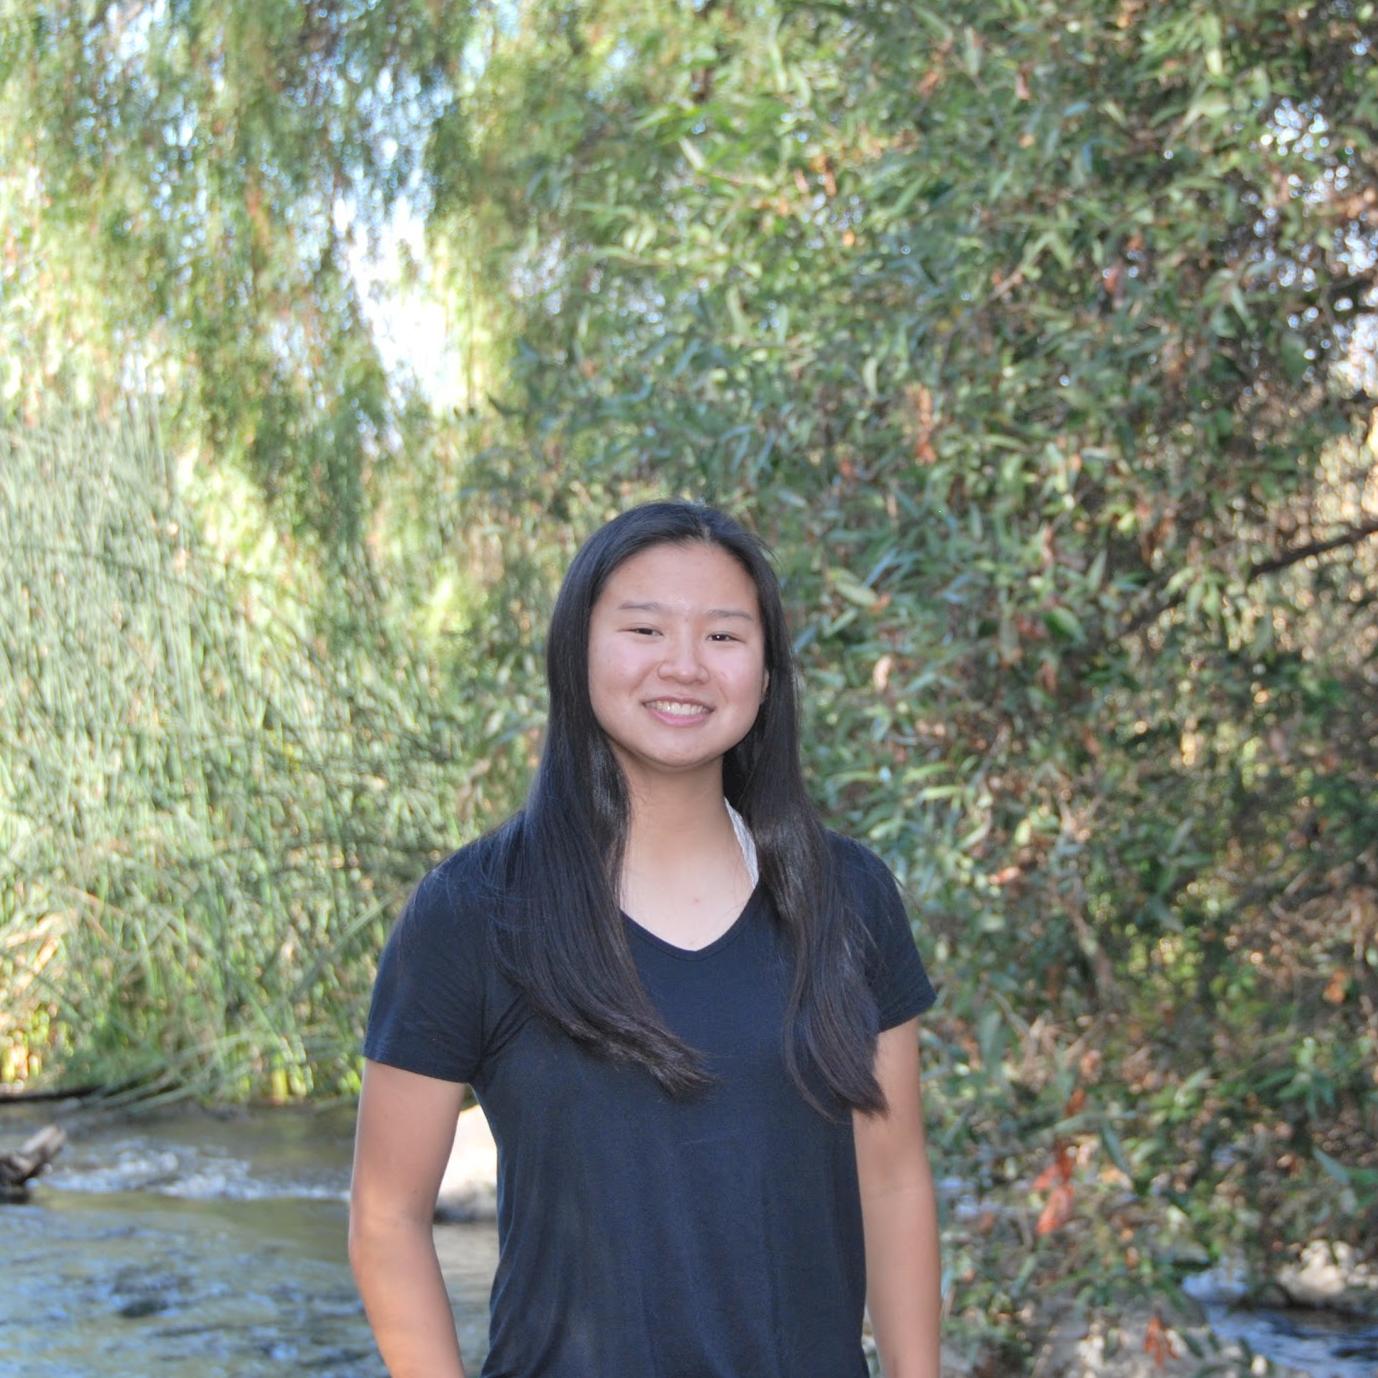 Samantha Chin from California State University